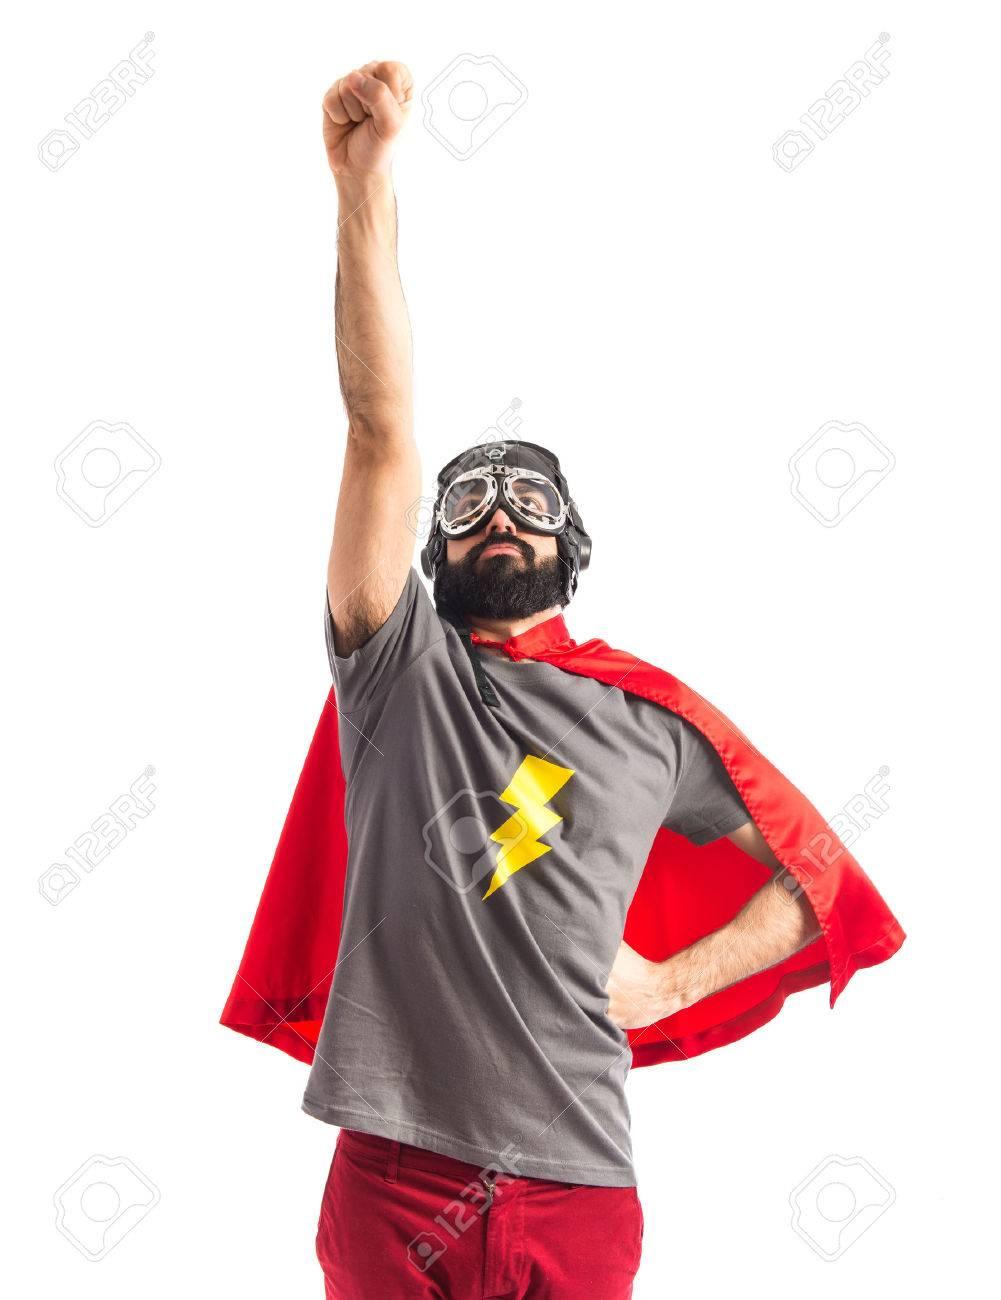 Superhero doing fly gesture Stock Photo - 40412233